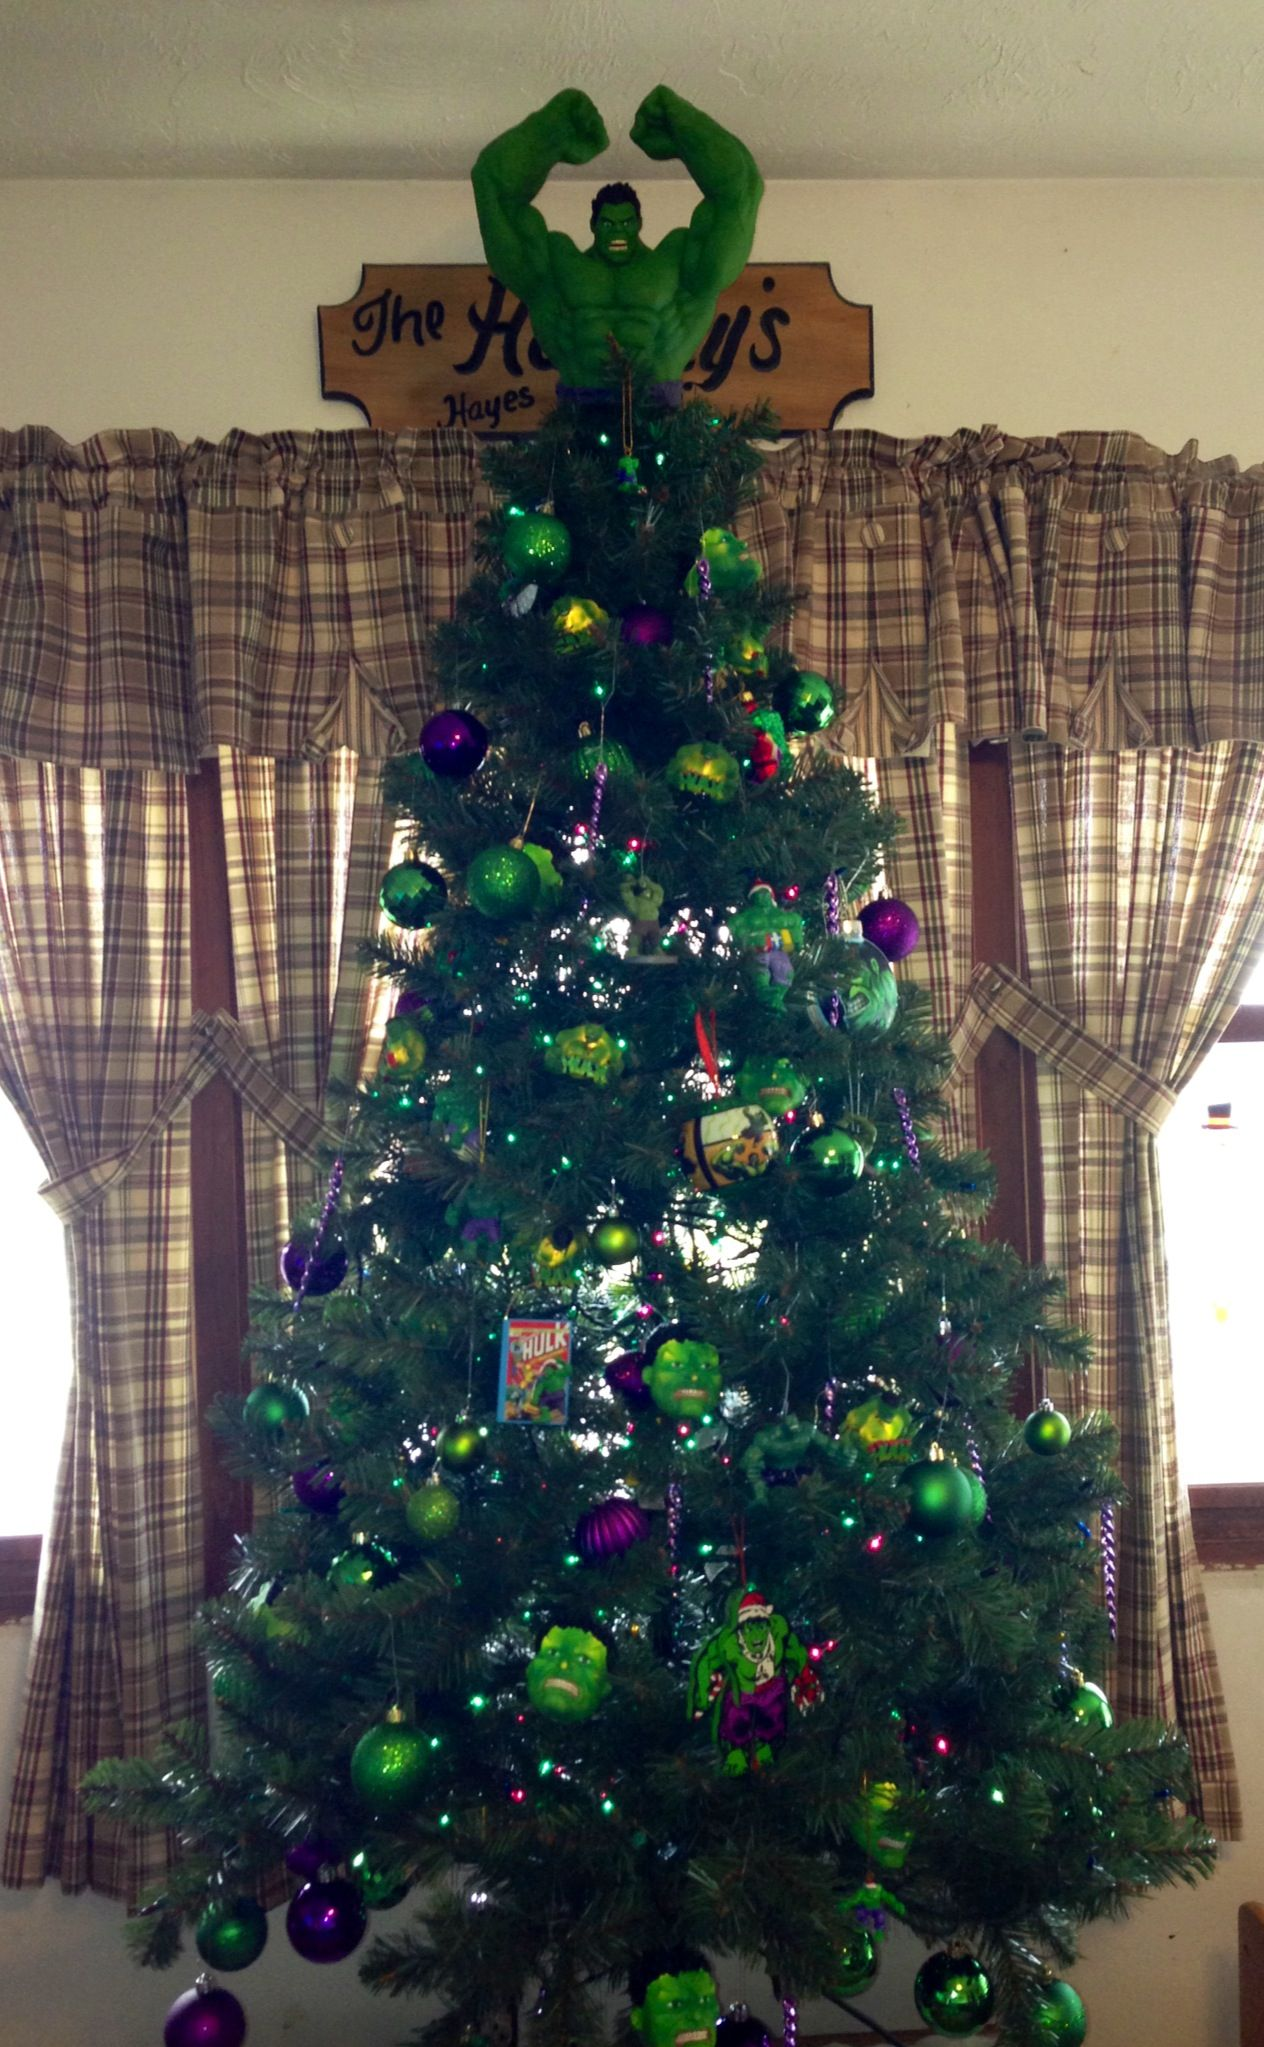 Batman christmas tree ornaments - Hulk Christmas Tree We Do A Theme Every Year This Year We Decided